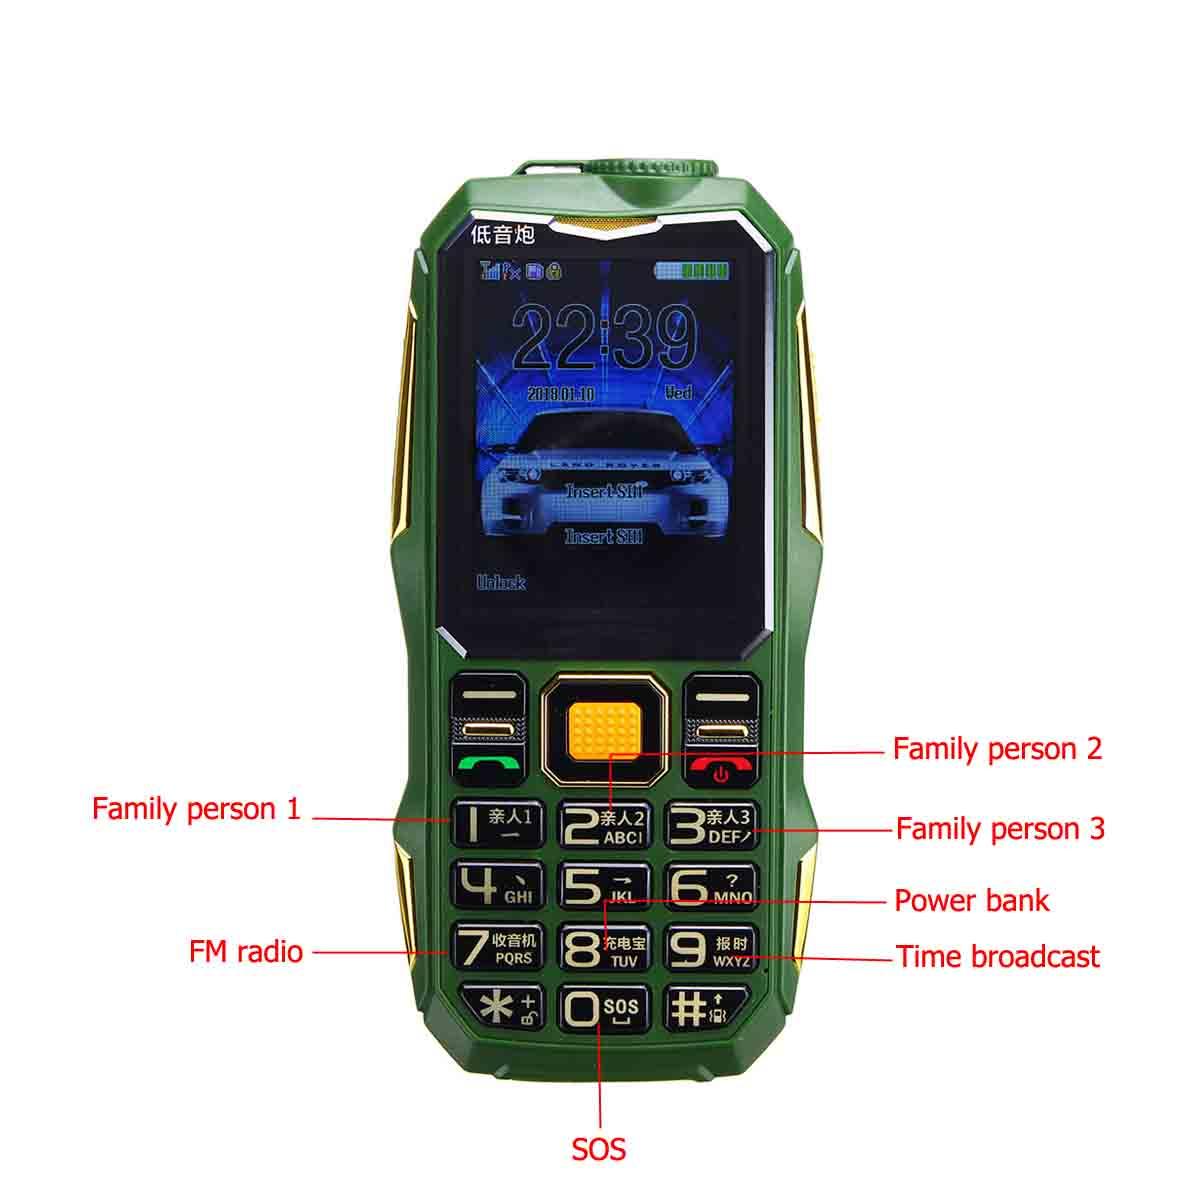 Handy Standby Hoher Akkuverbrauch